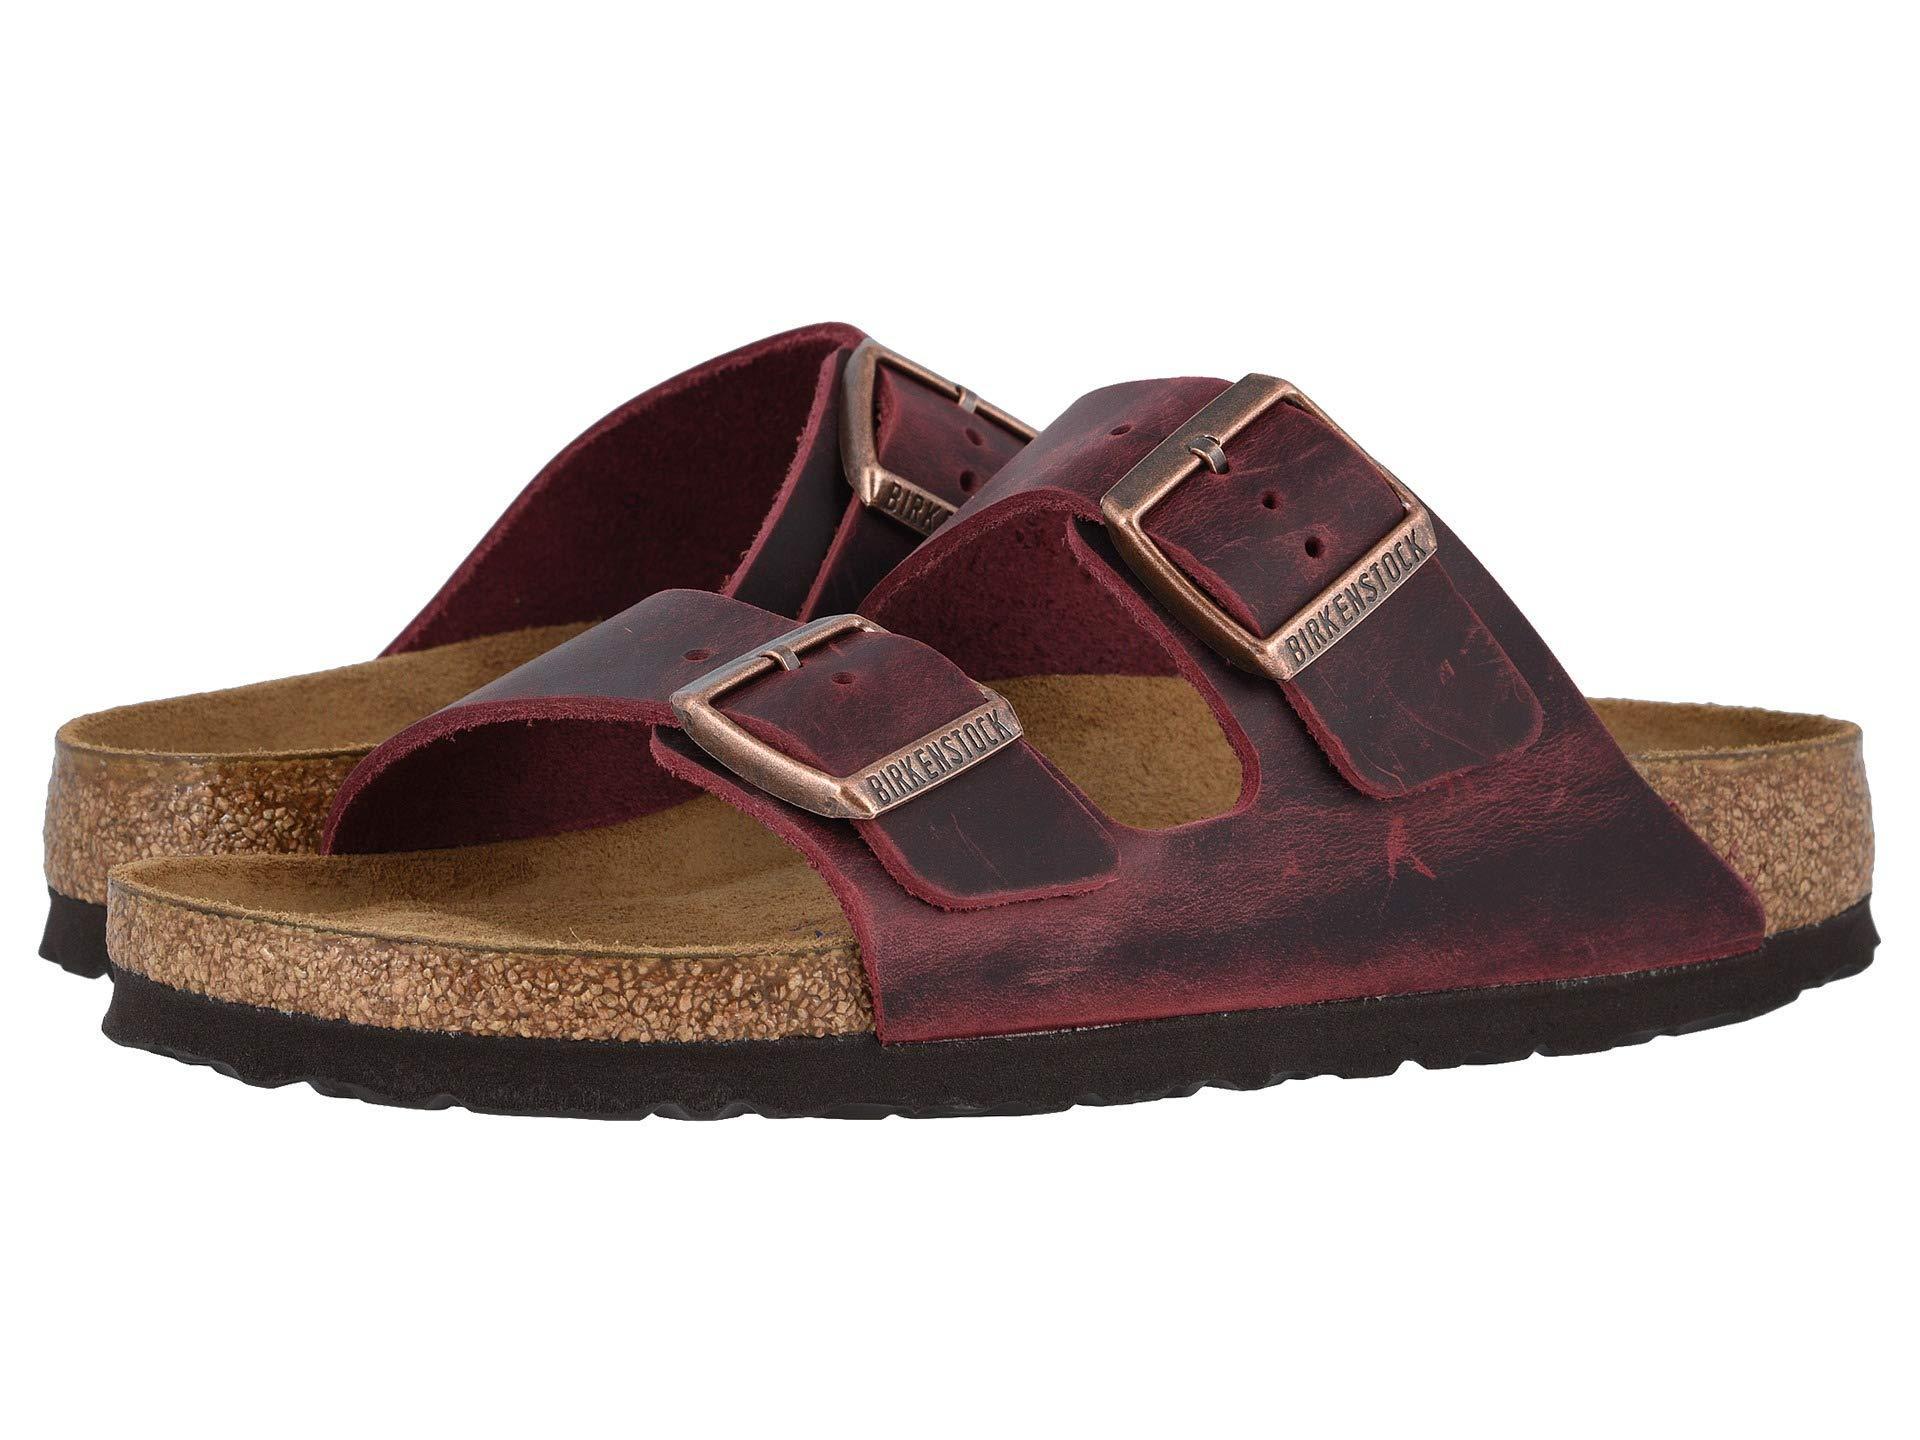 411d288a0 Birkenstock - Brown Arizona Soft Footbed (zinfandel Oiled Leather) Women's  Sandals - Lyst. View fullscreen